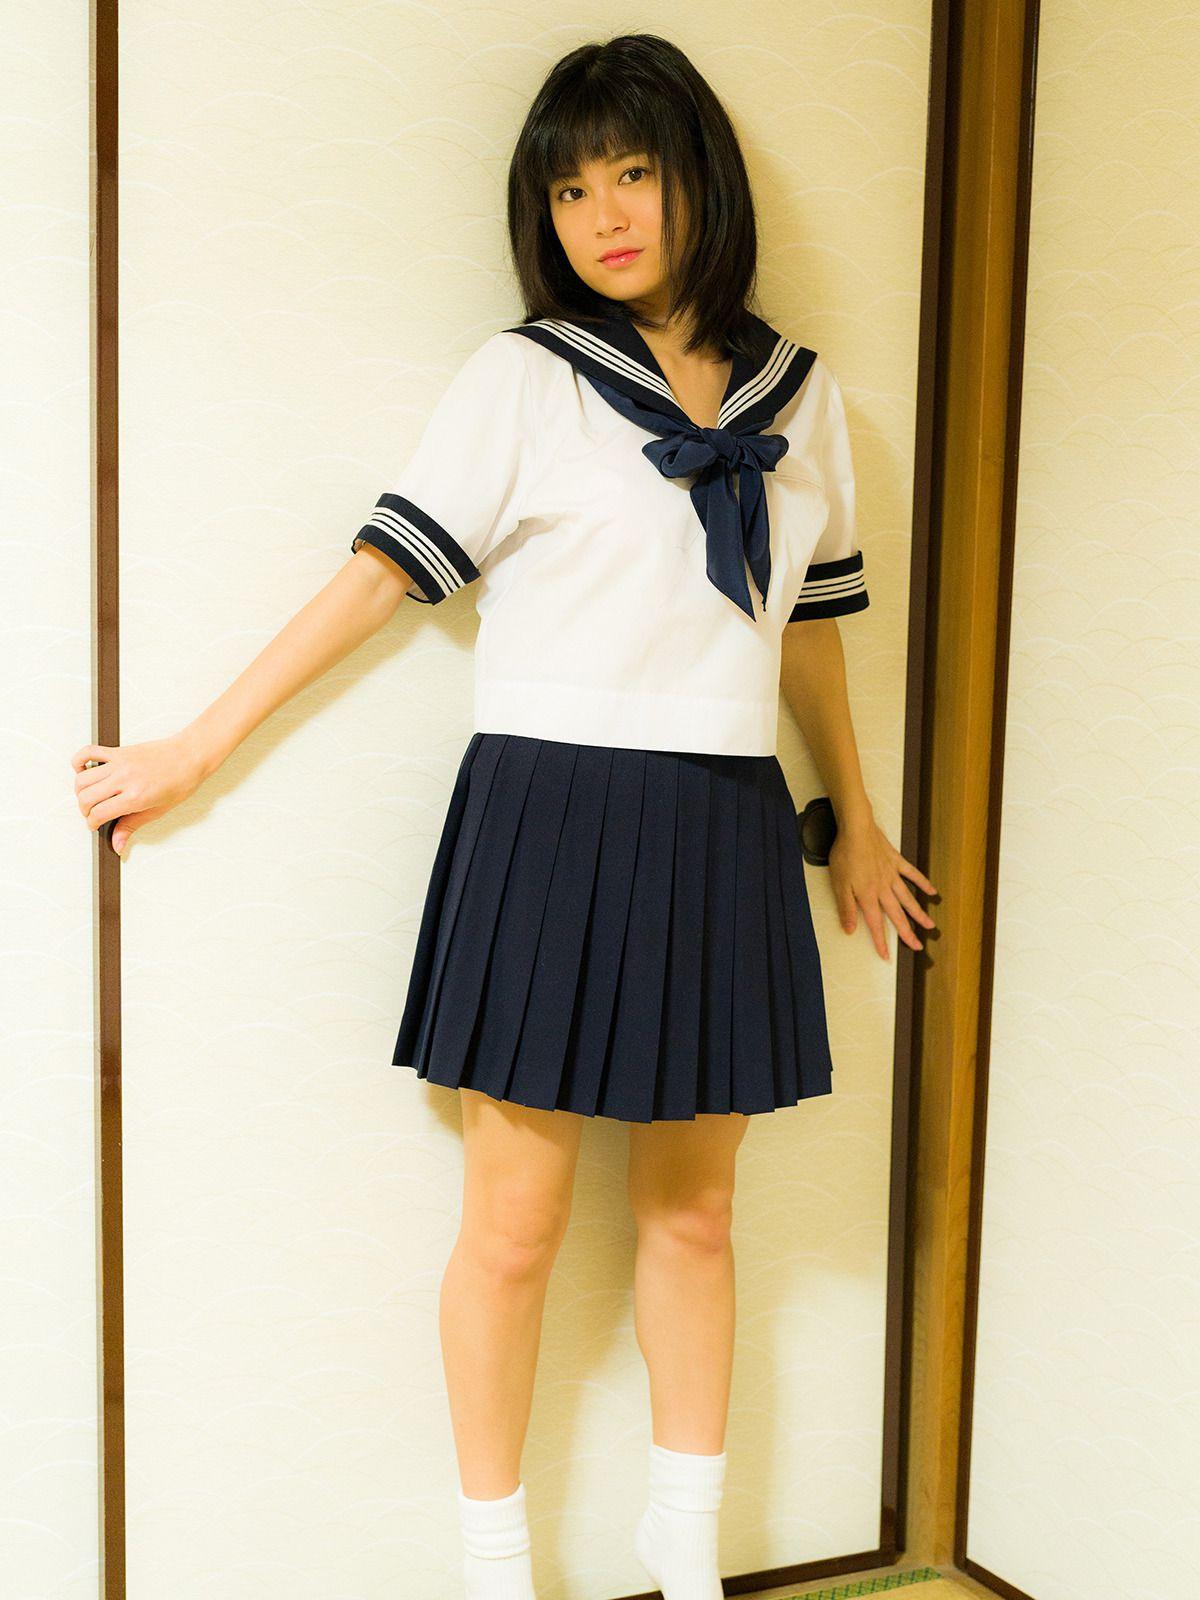 VOL.419 [Sabra]大胸日本萌妹子:RaMu超高清写真套图(100P)